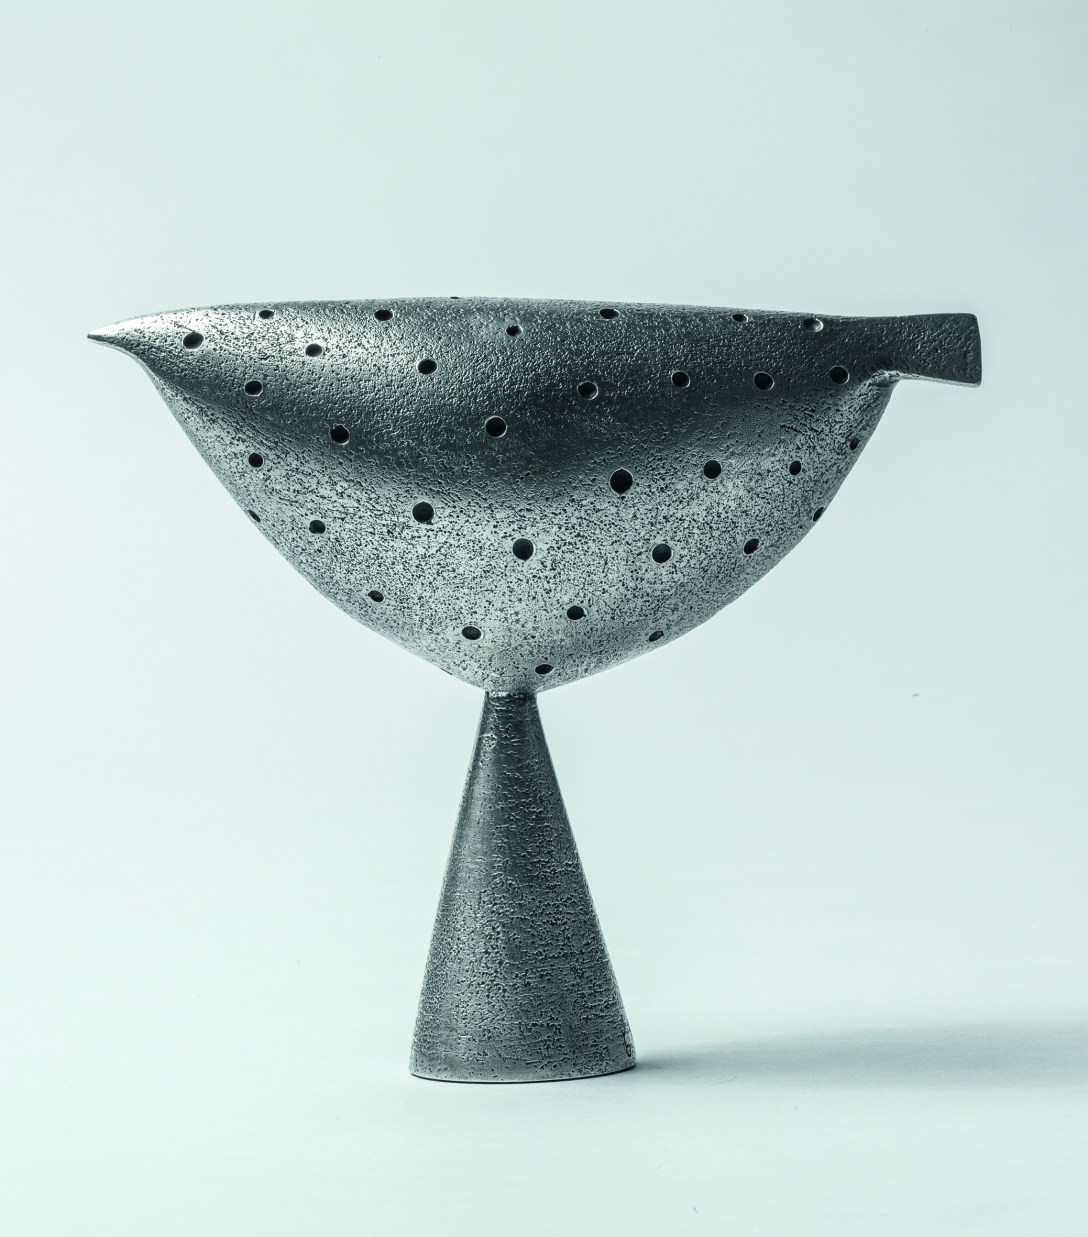 'Silver' 'Casting' of Jon Buck's 'Sculpture' Early Bird at Pangolin Editions